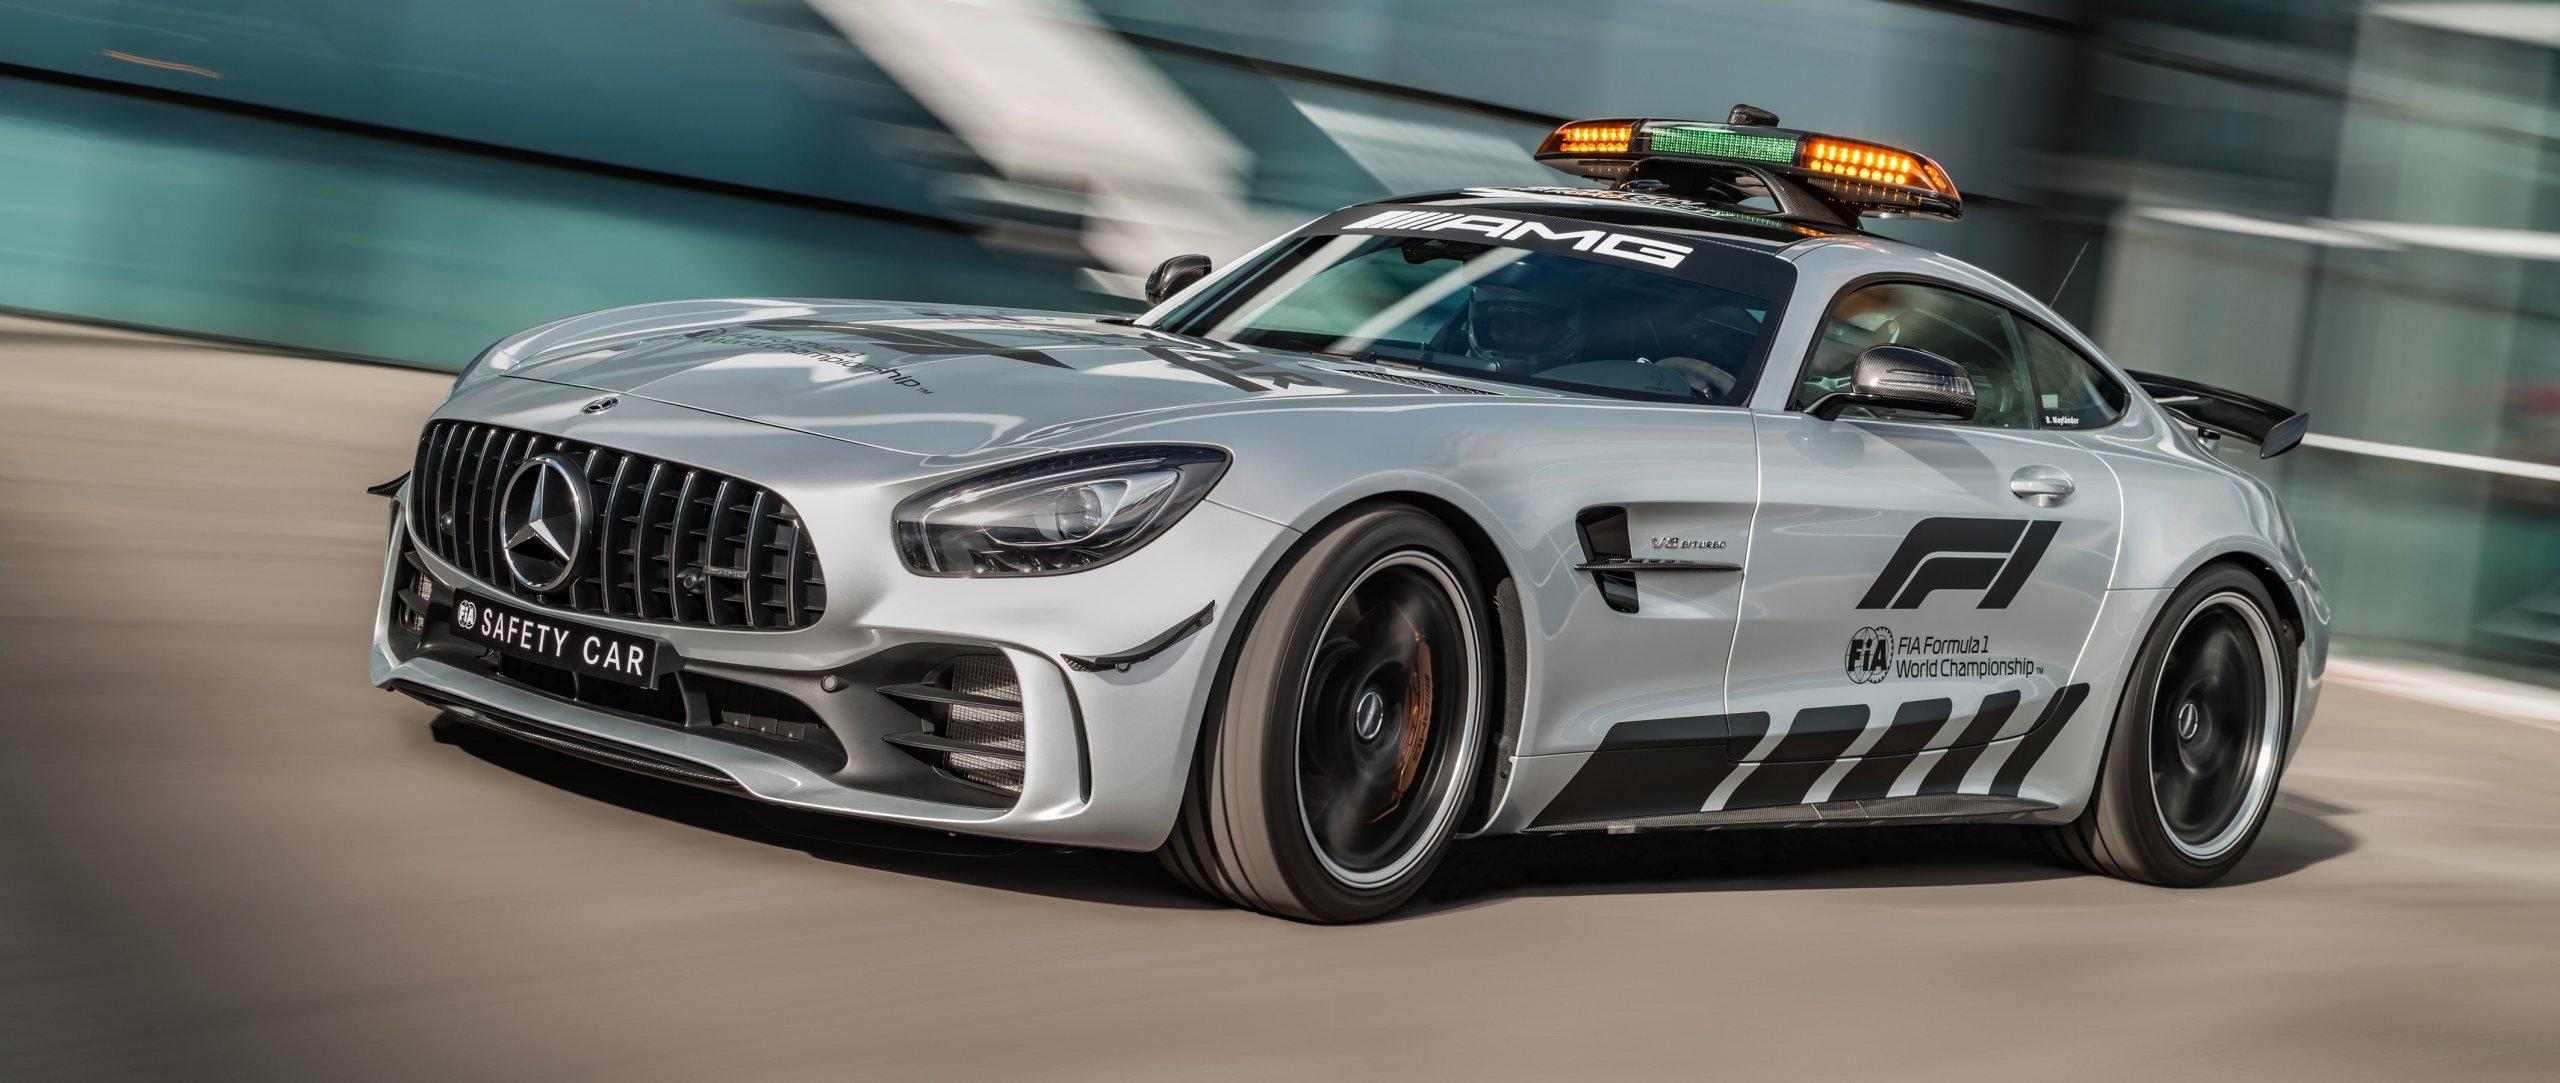 """Safety Car"" во Formula 1 ги здружува Aston Martin и Mercedes"